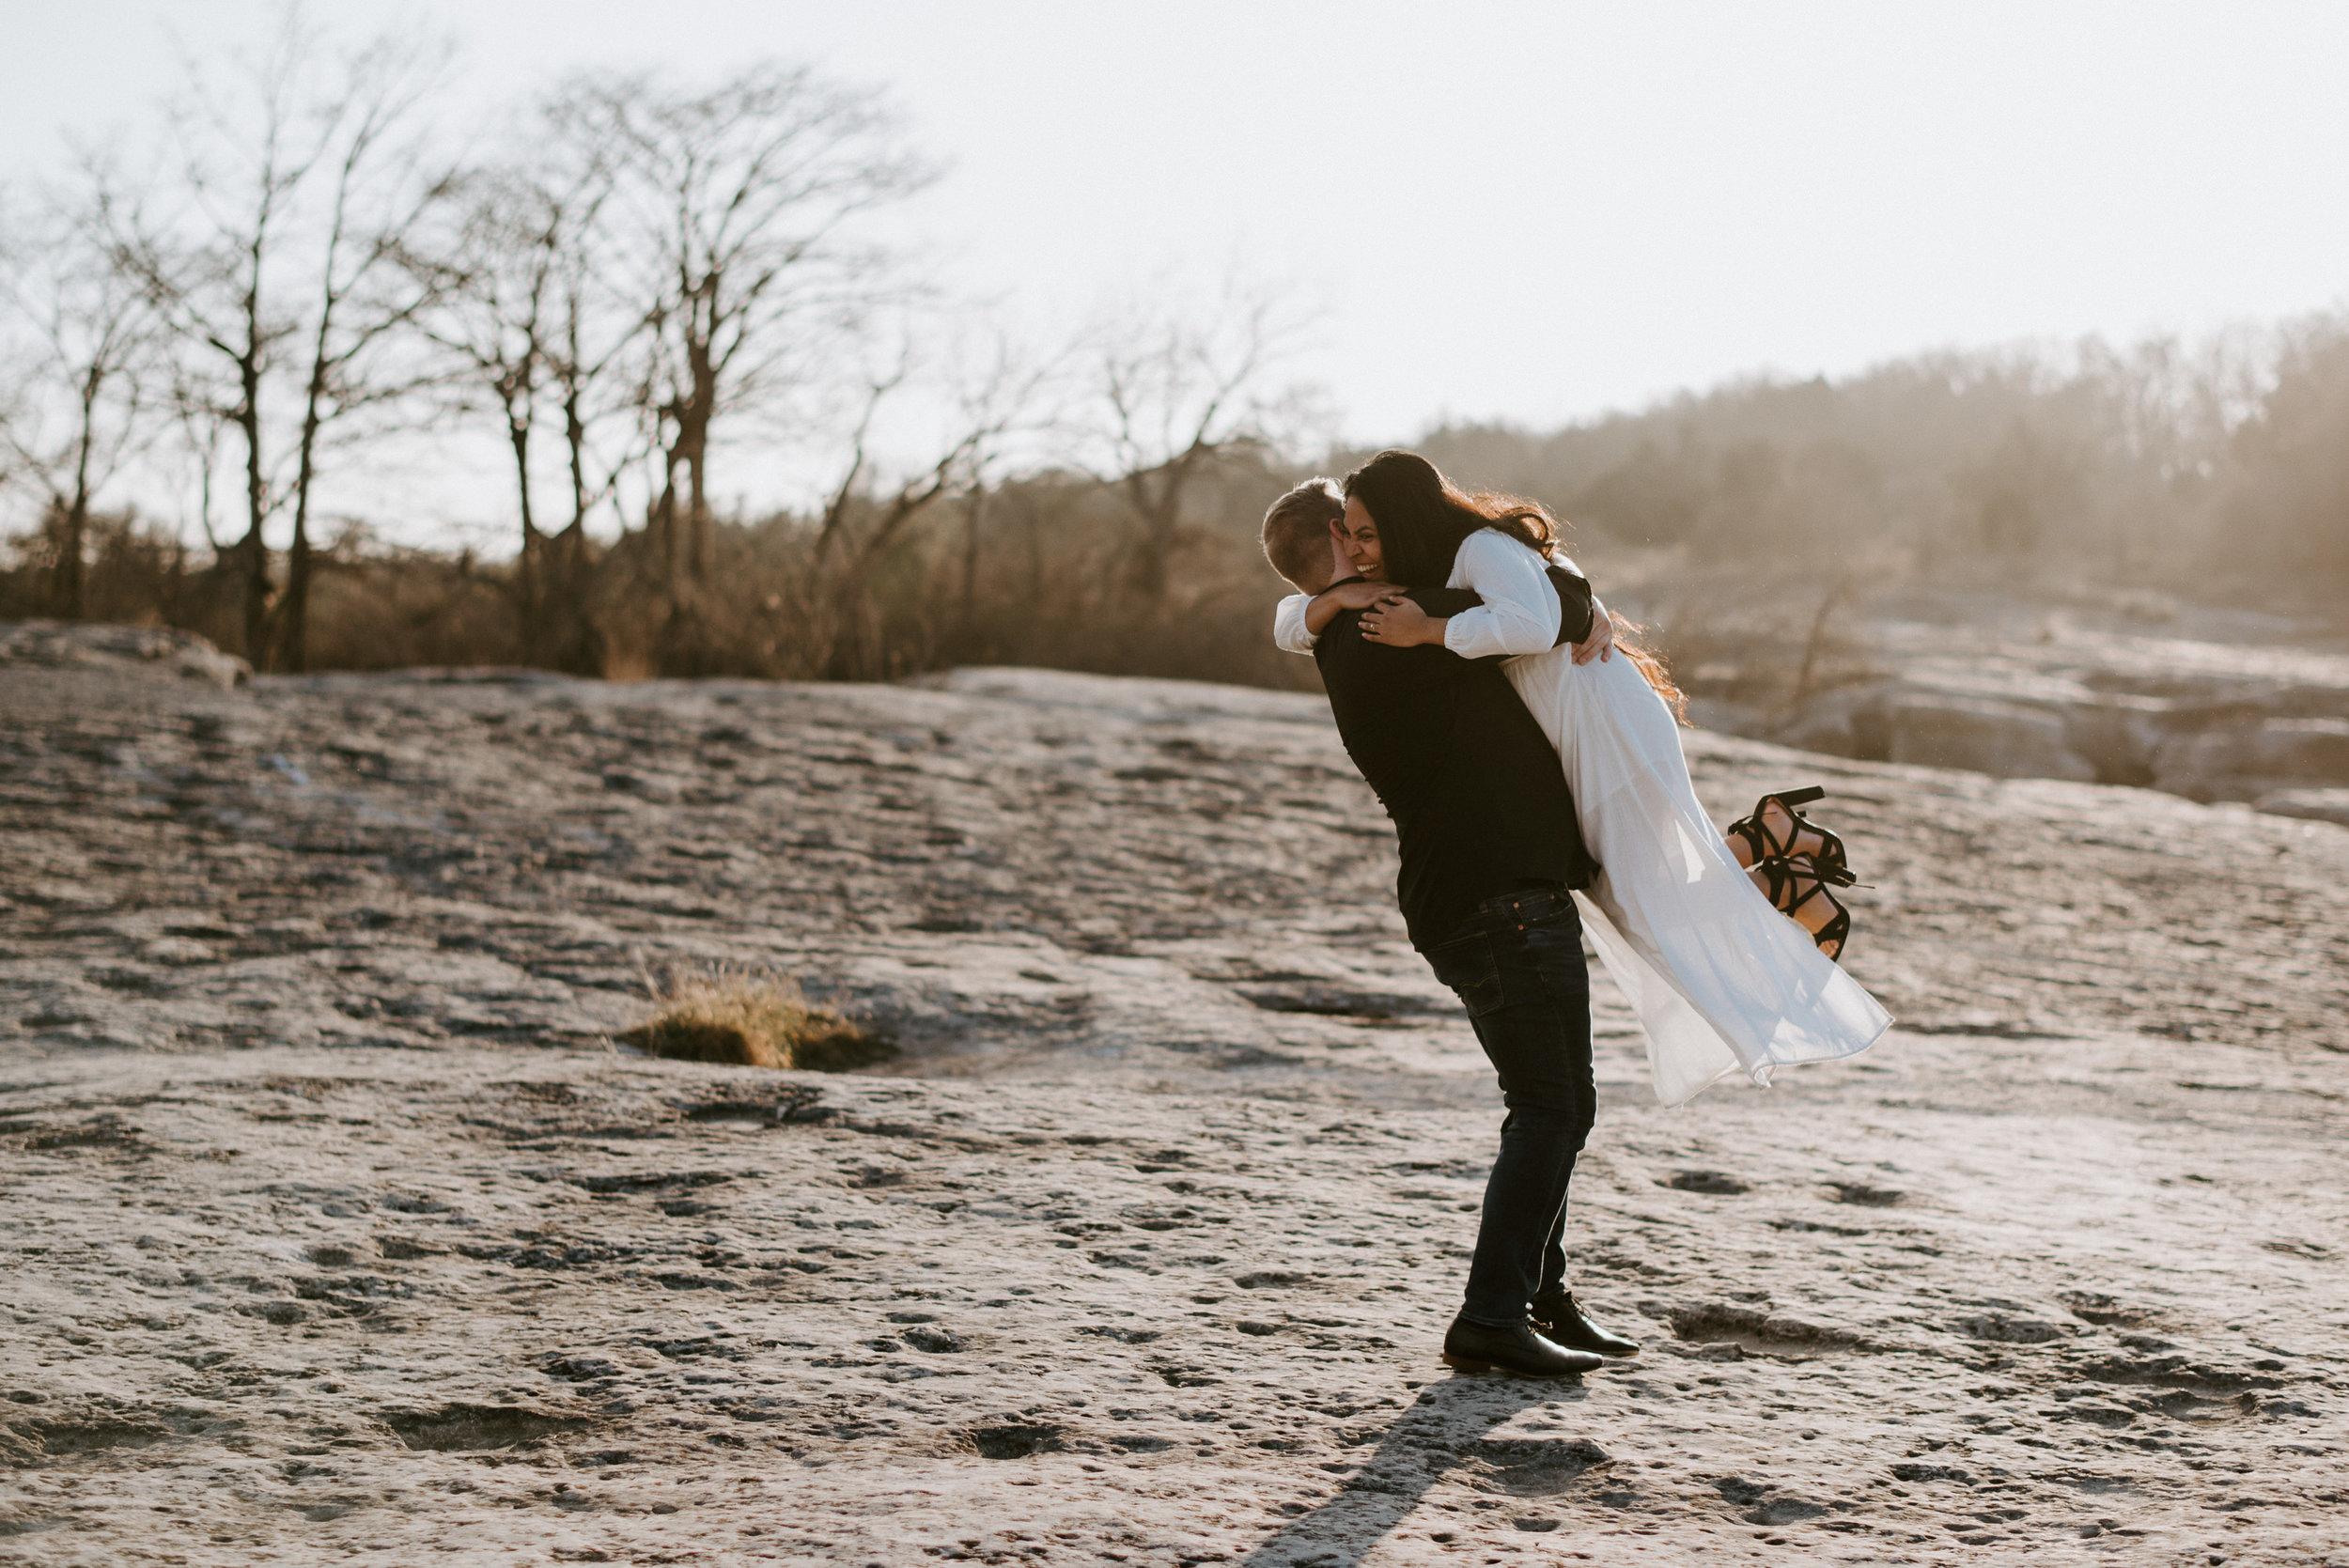 couple dances at engagement photoshoot